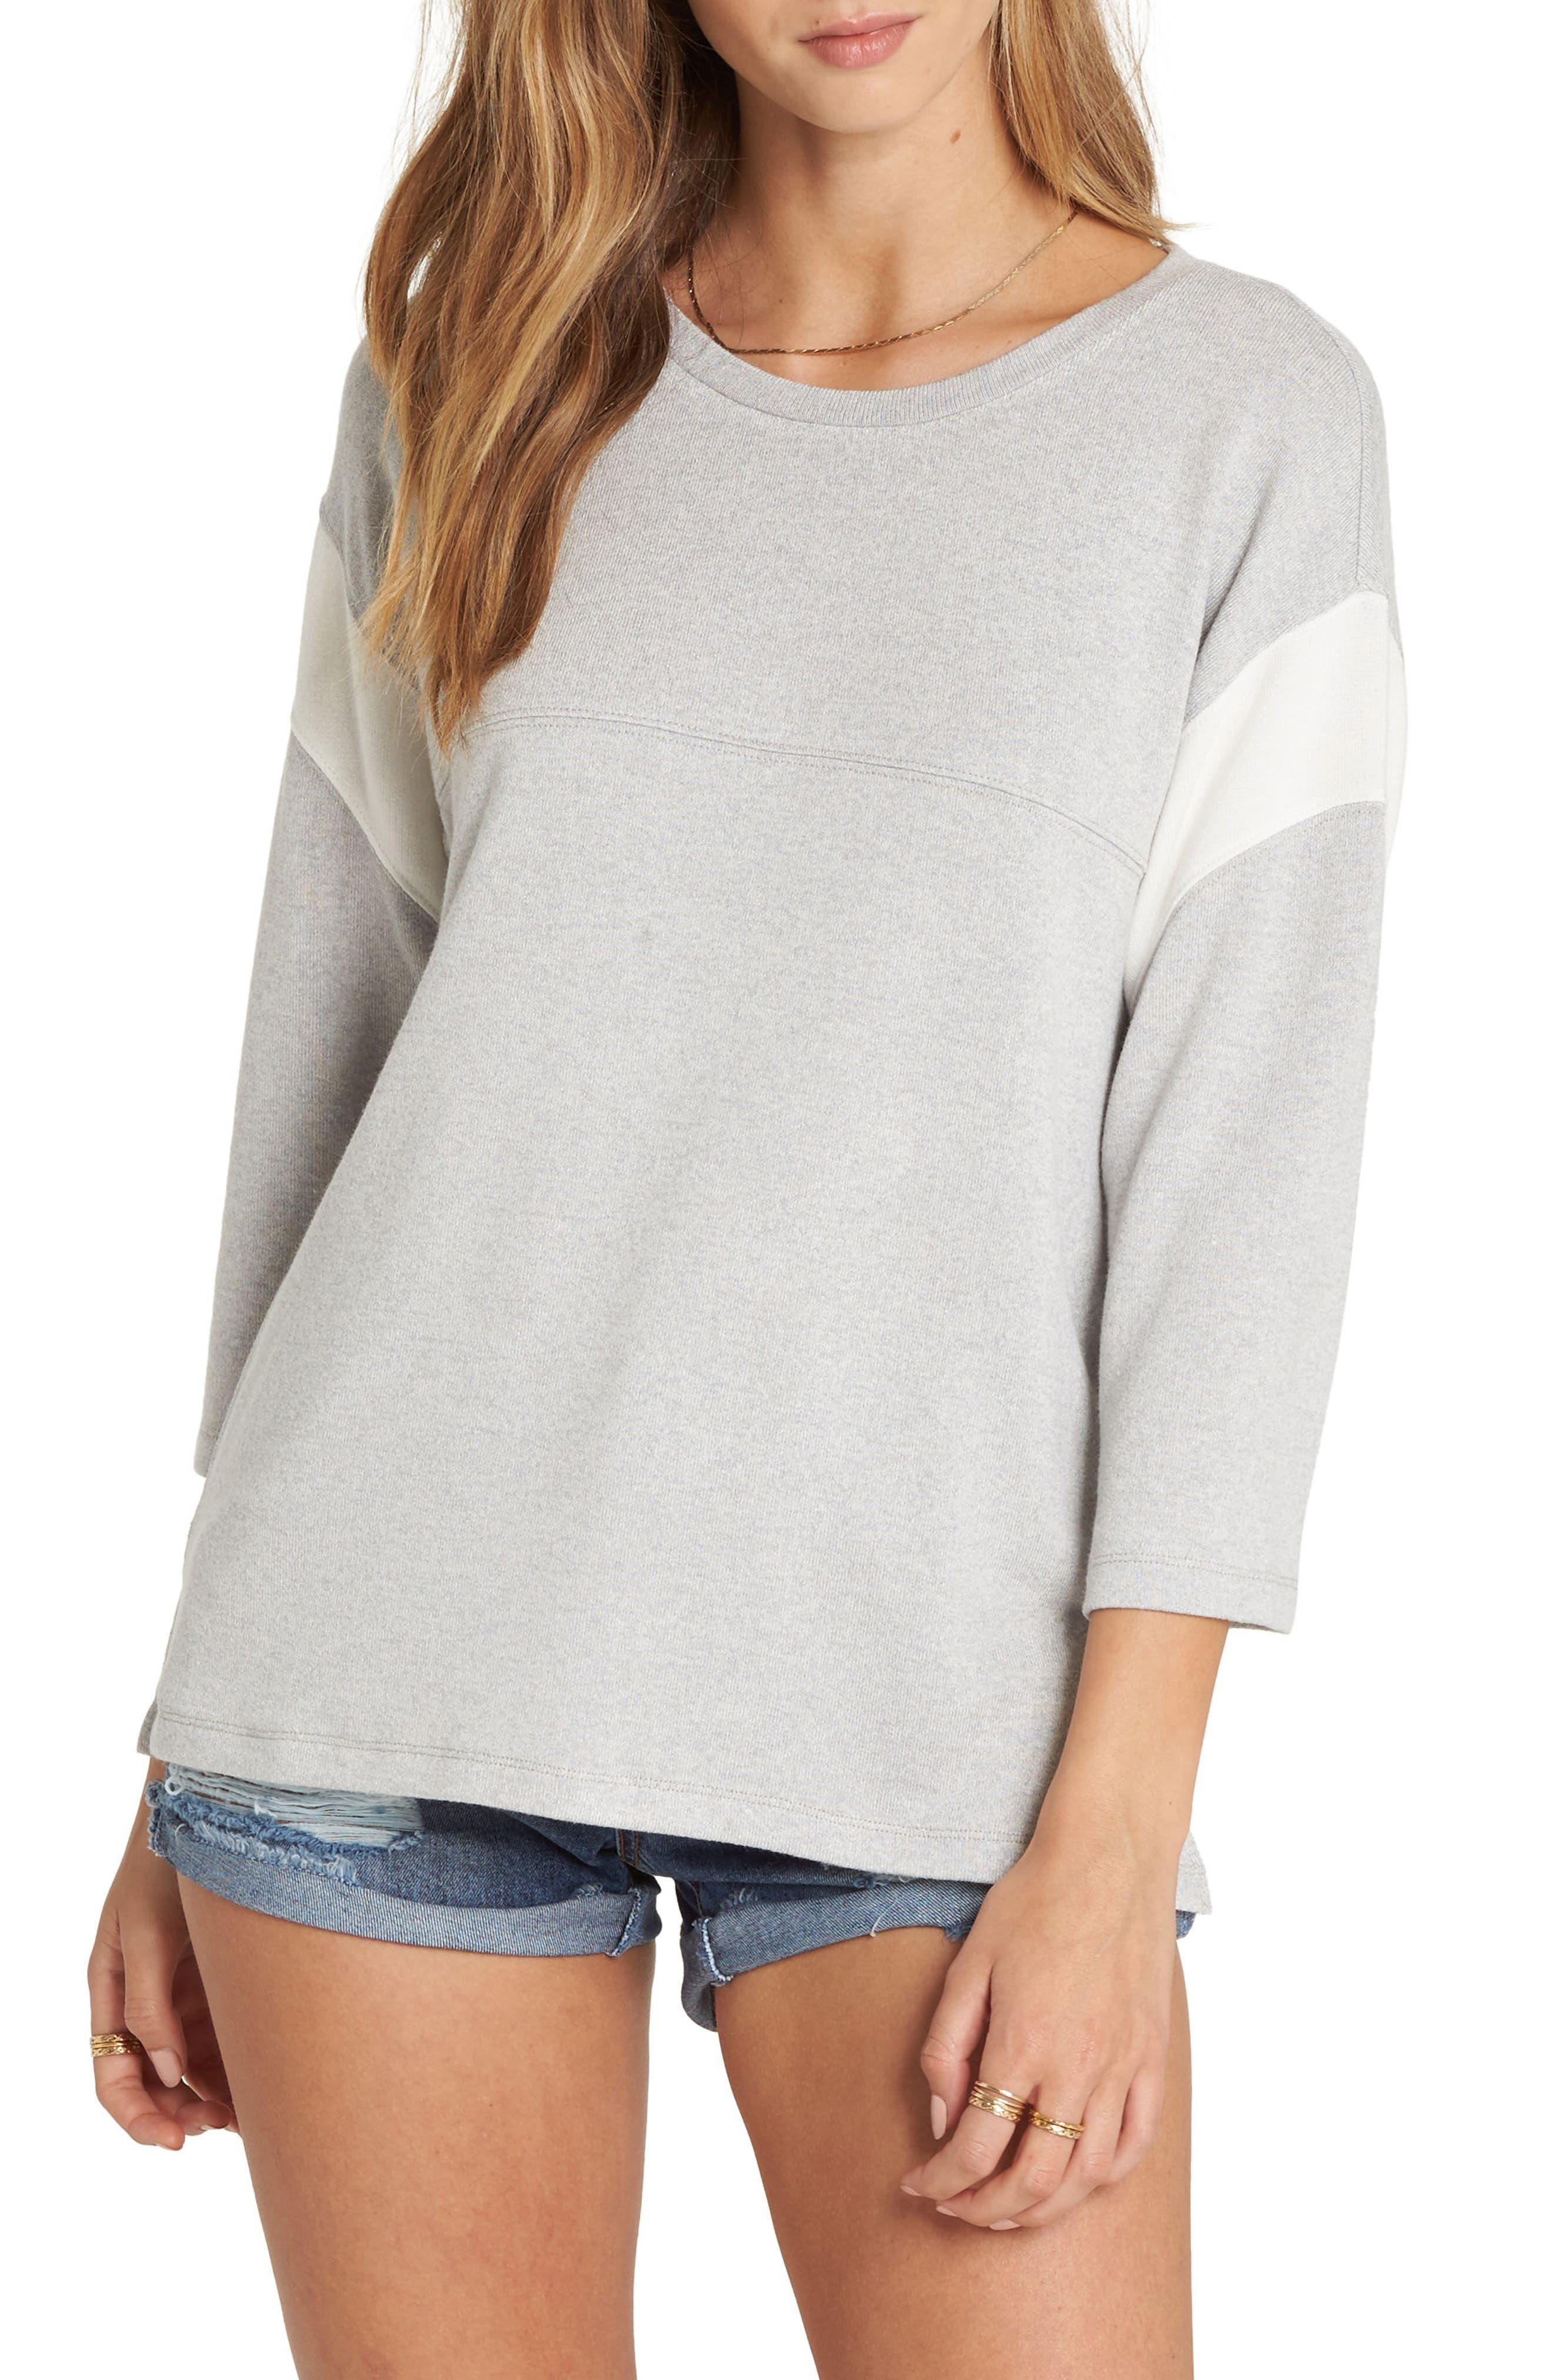 Kicking Game Sweatshirt,                             Main thumbnail 1, color,                             Ice Athletic Grey